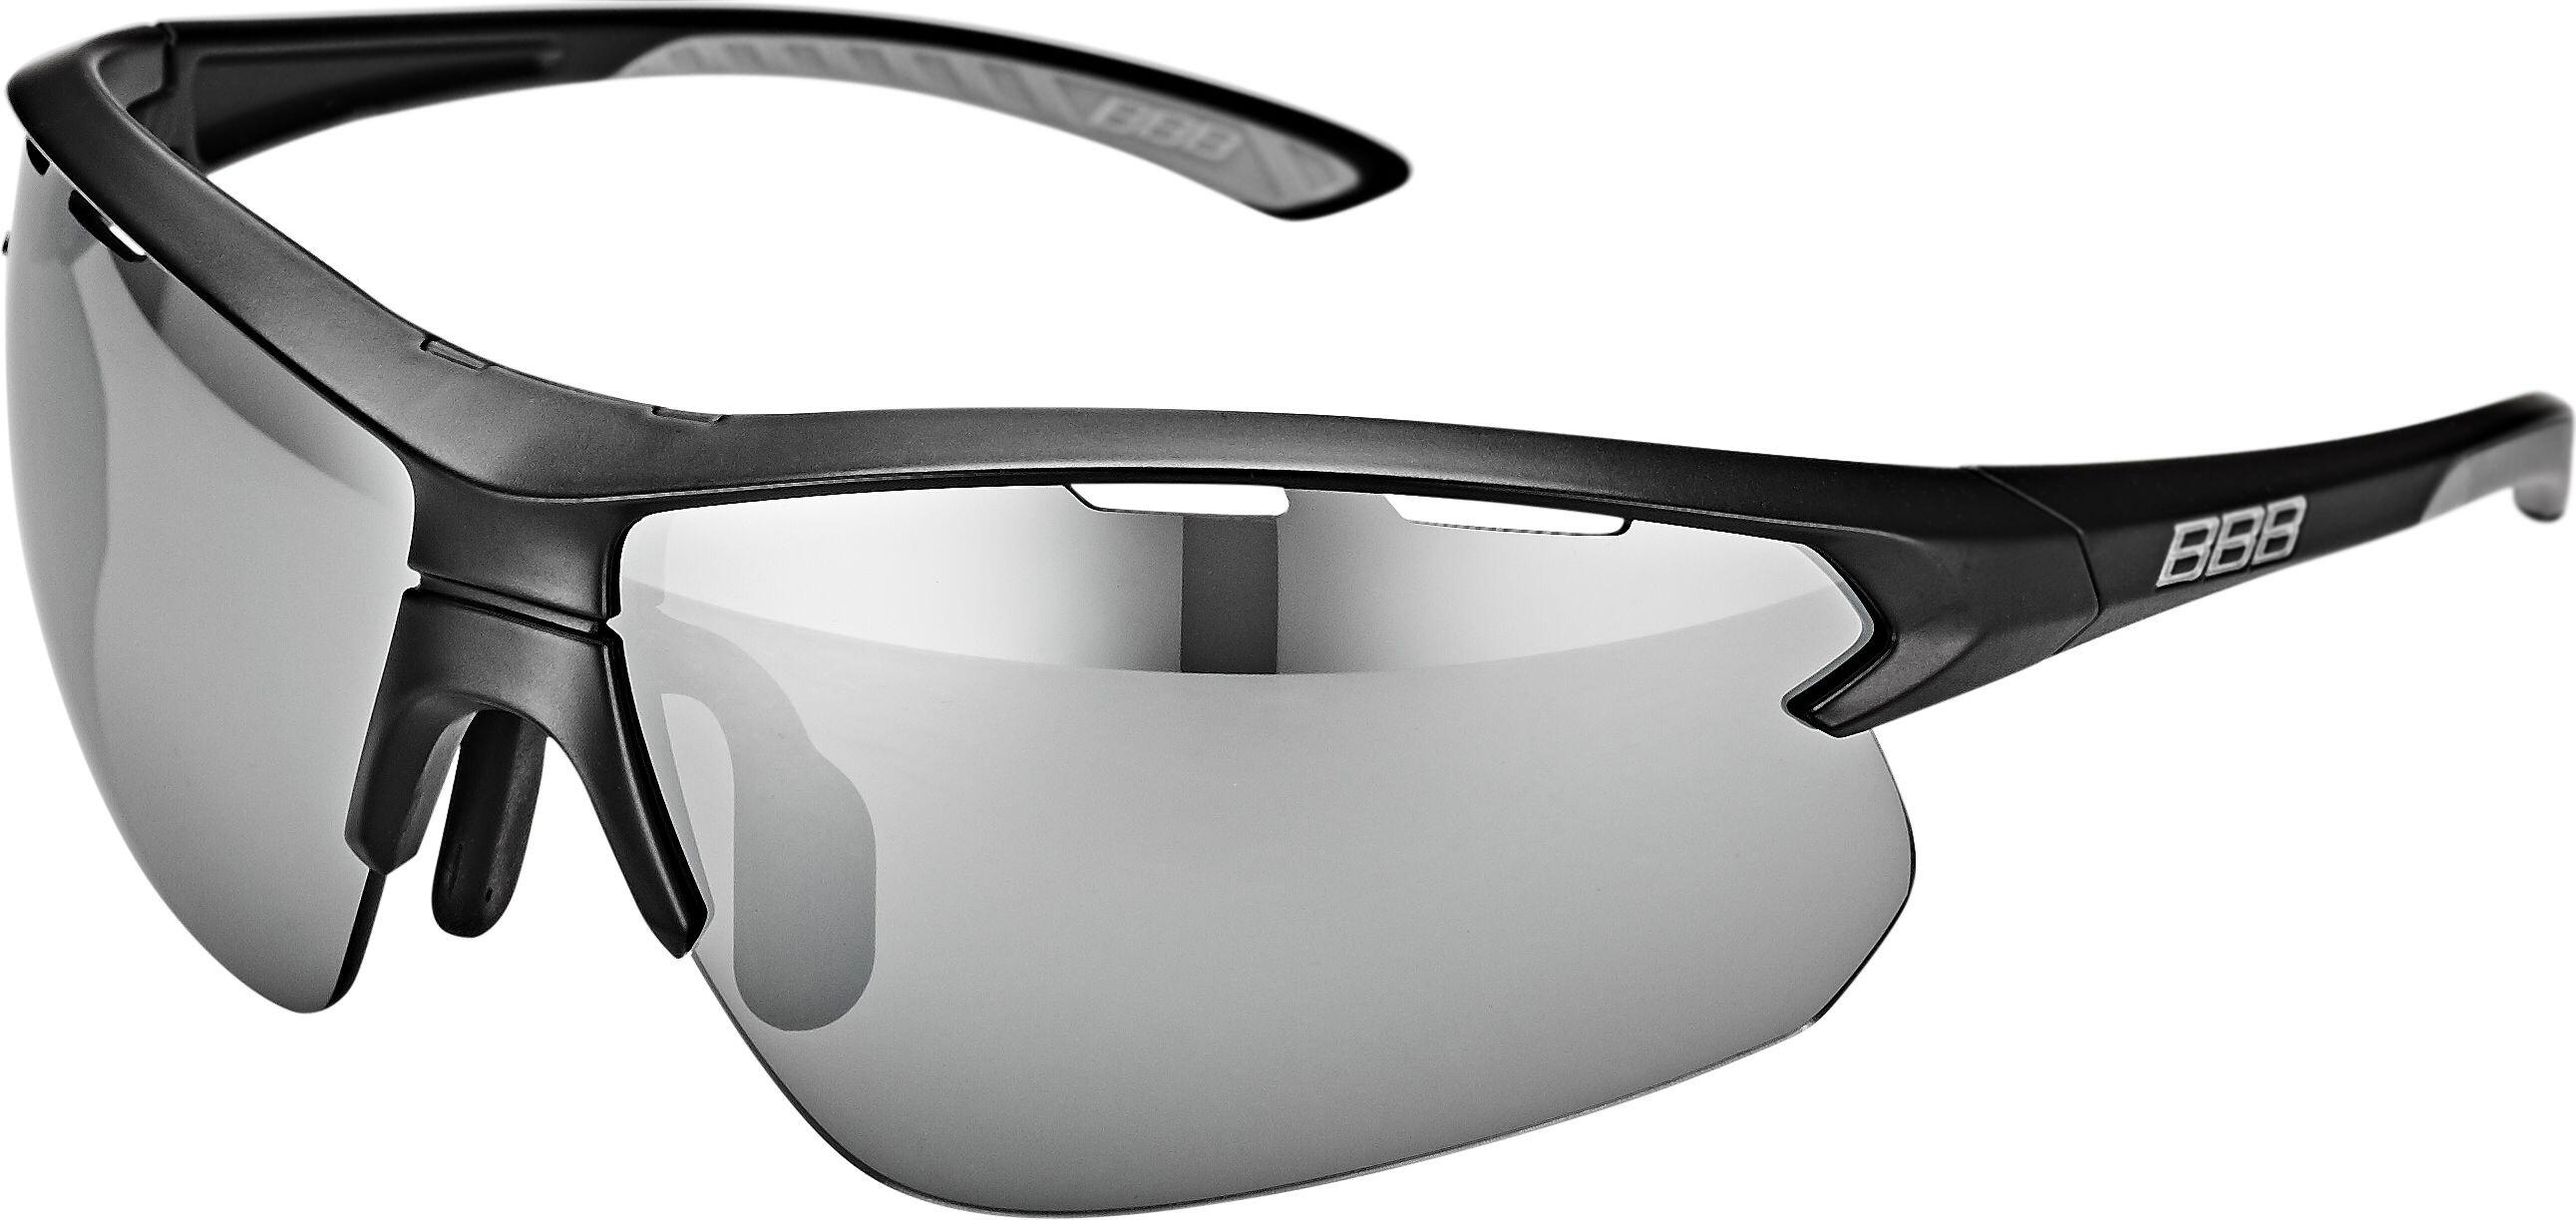 f67233d9a2ad BBB Impulse BSG-52 Cykelbriller sort